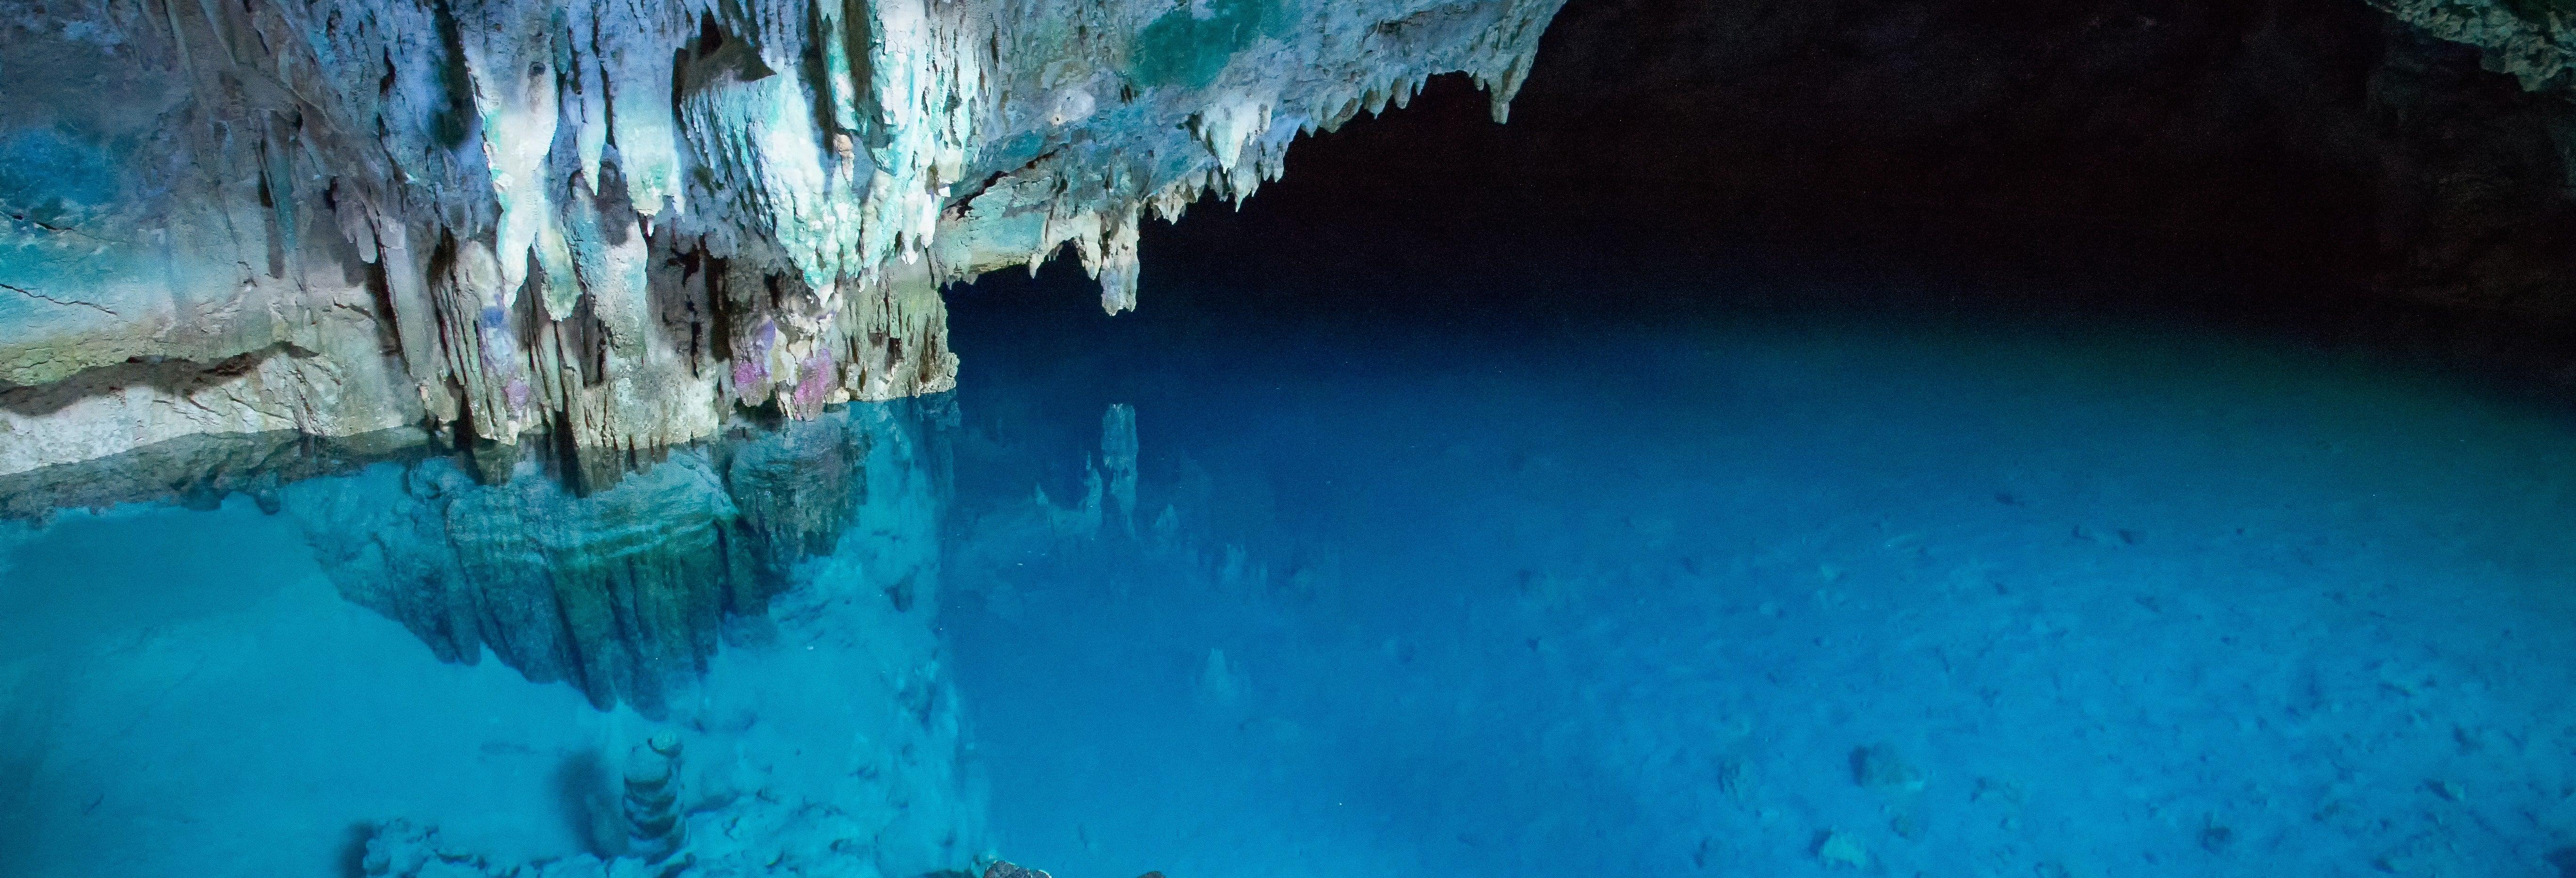 Batu Cermin & Rangko Cave Tour